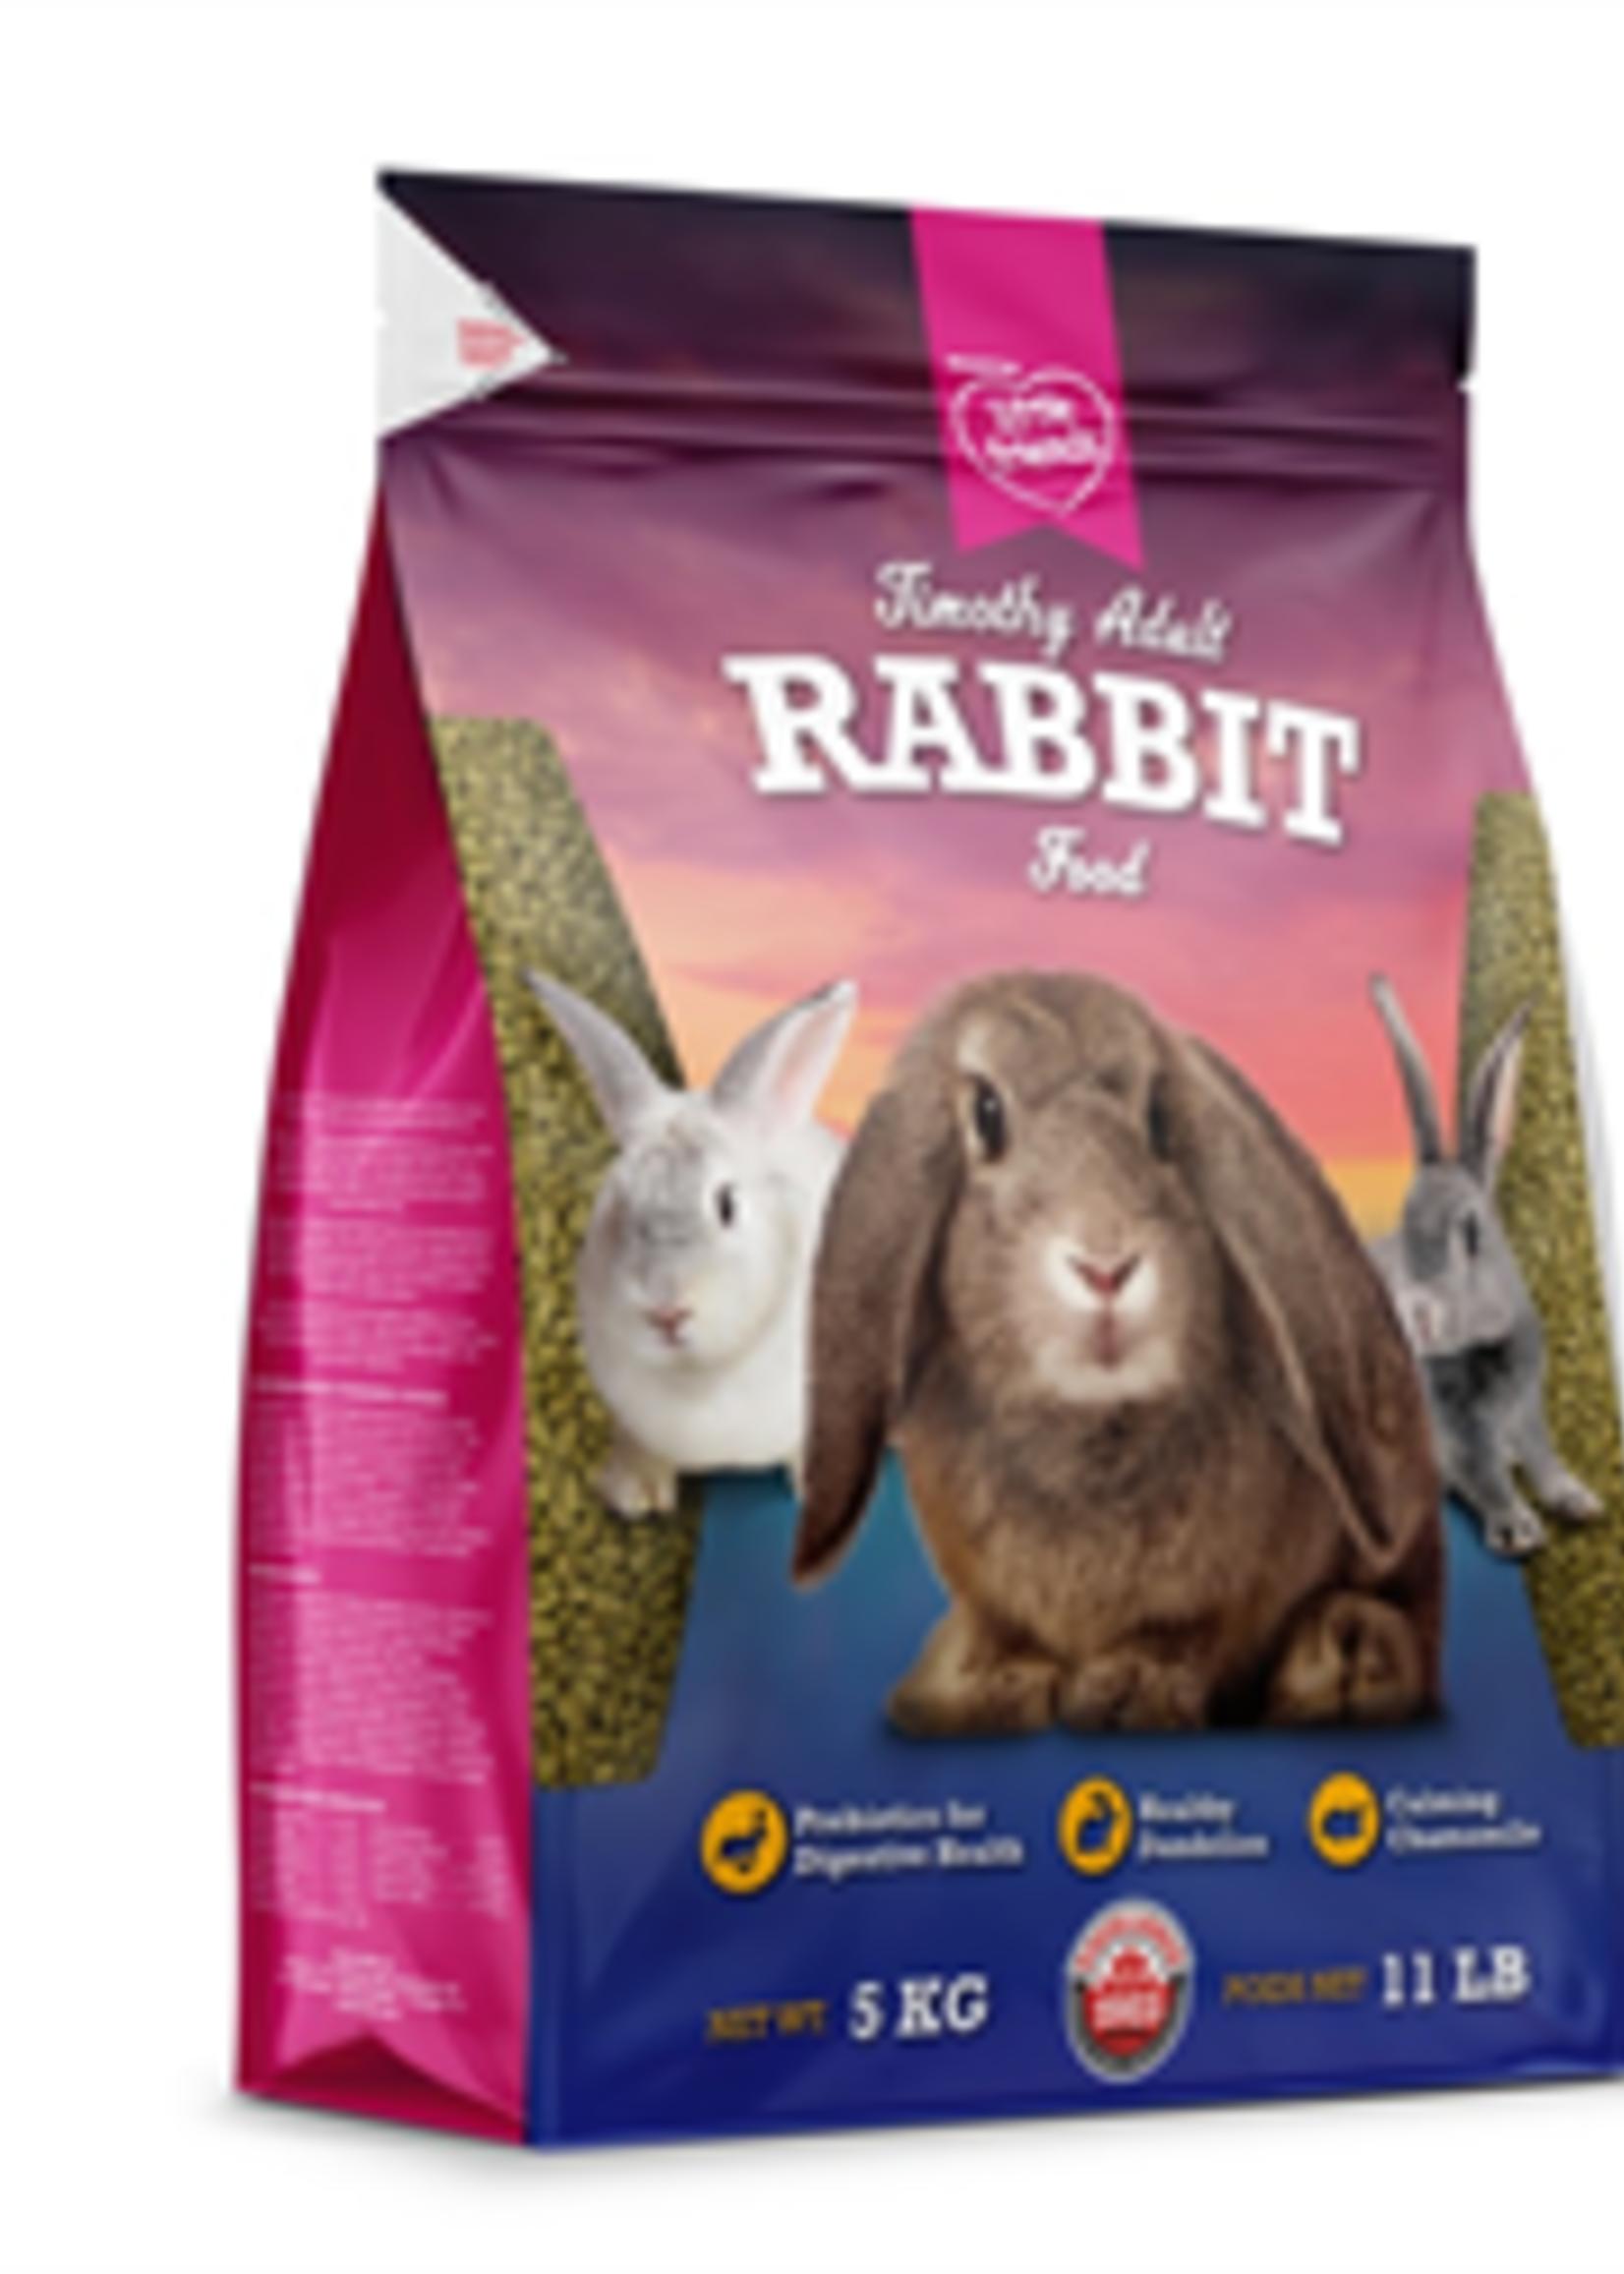 Martin little friends™ Timothy Adult Rabbit Food 5kG